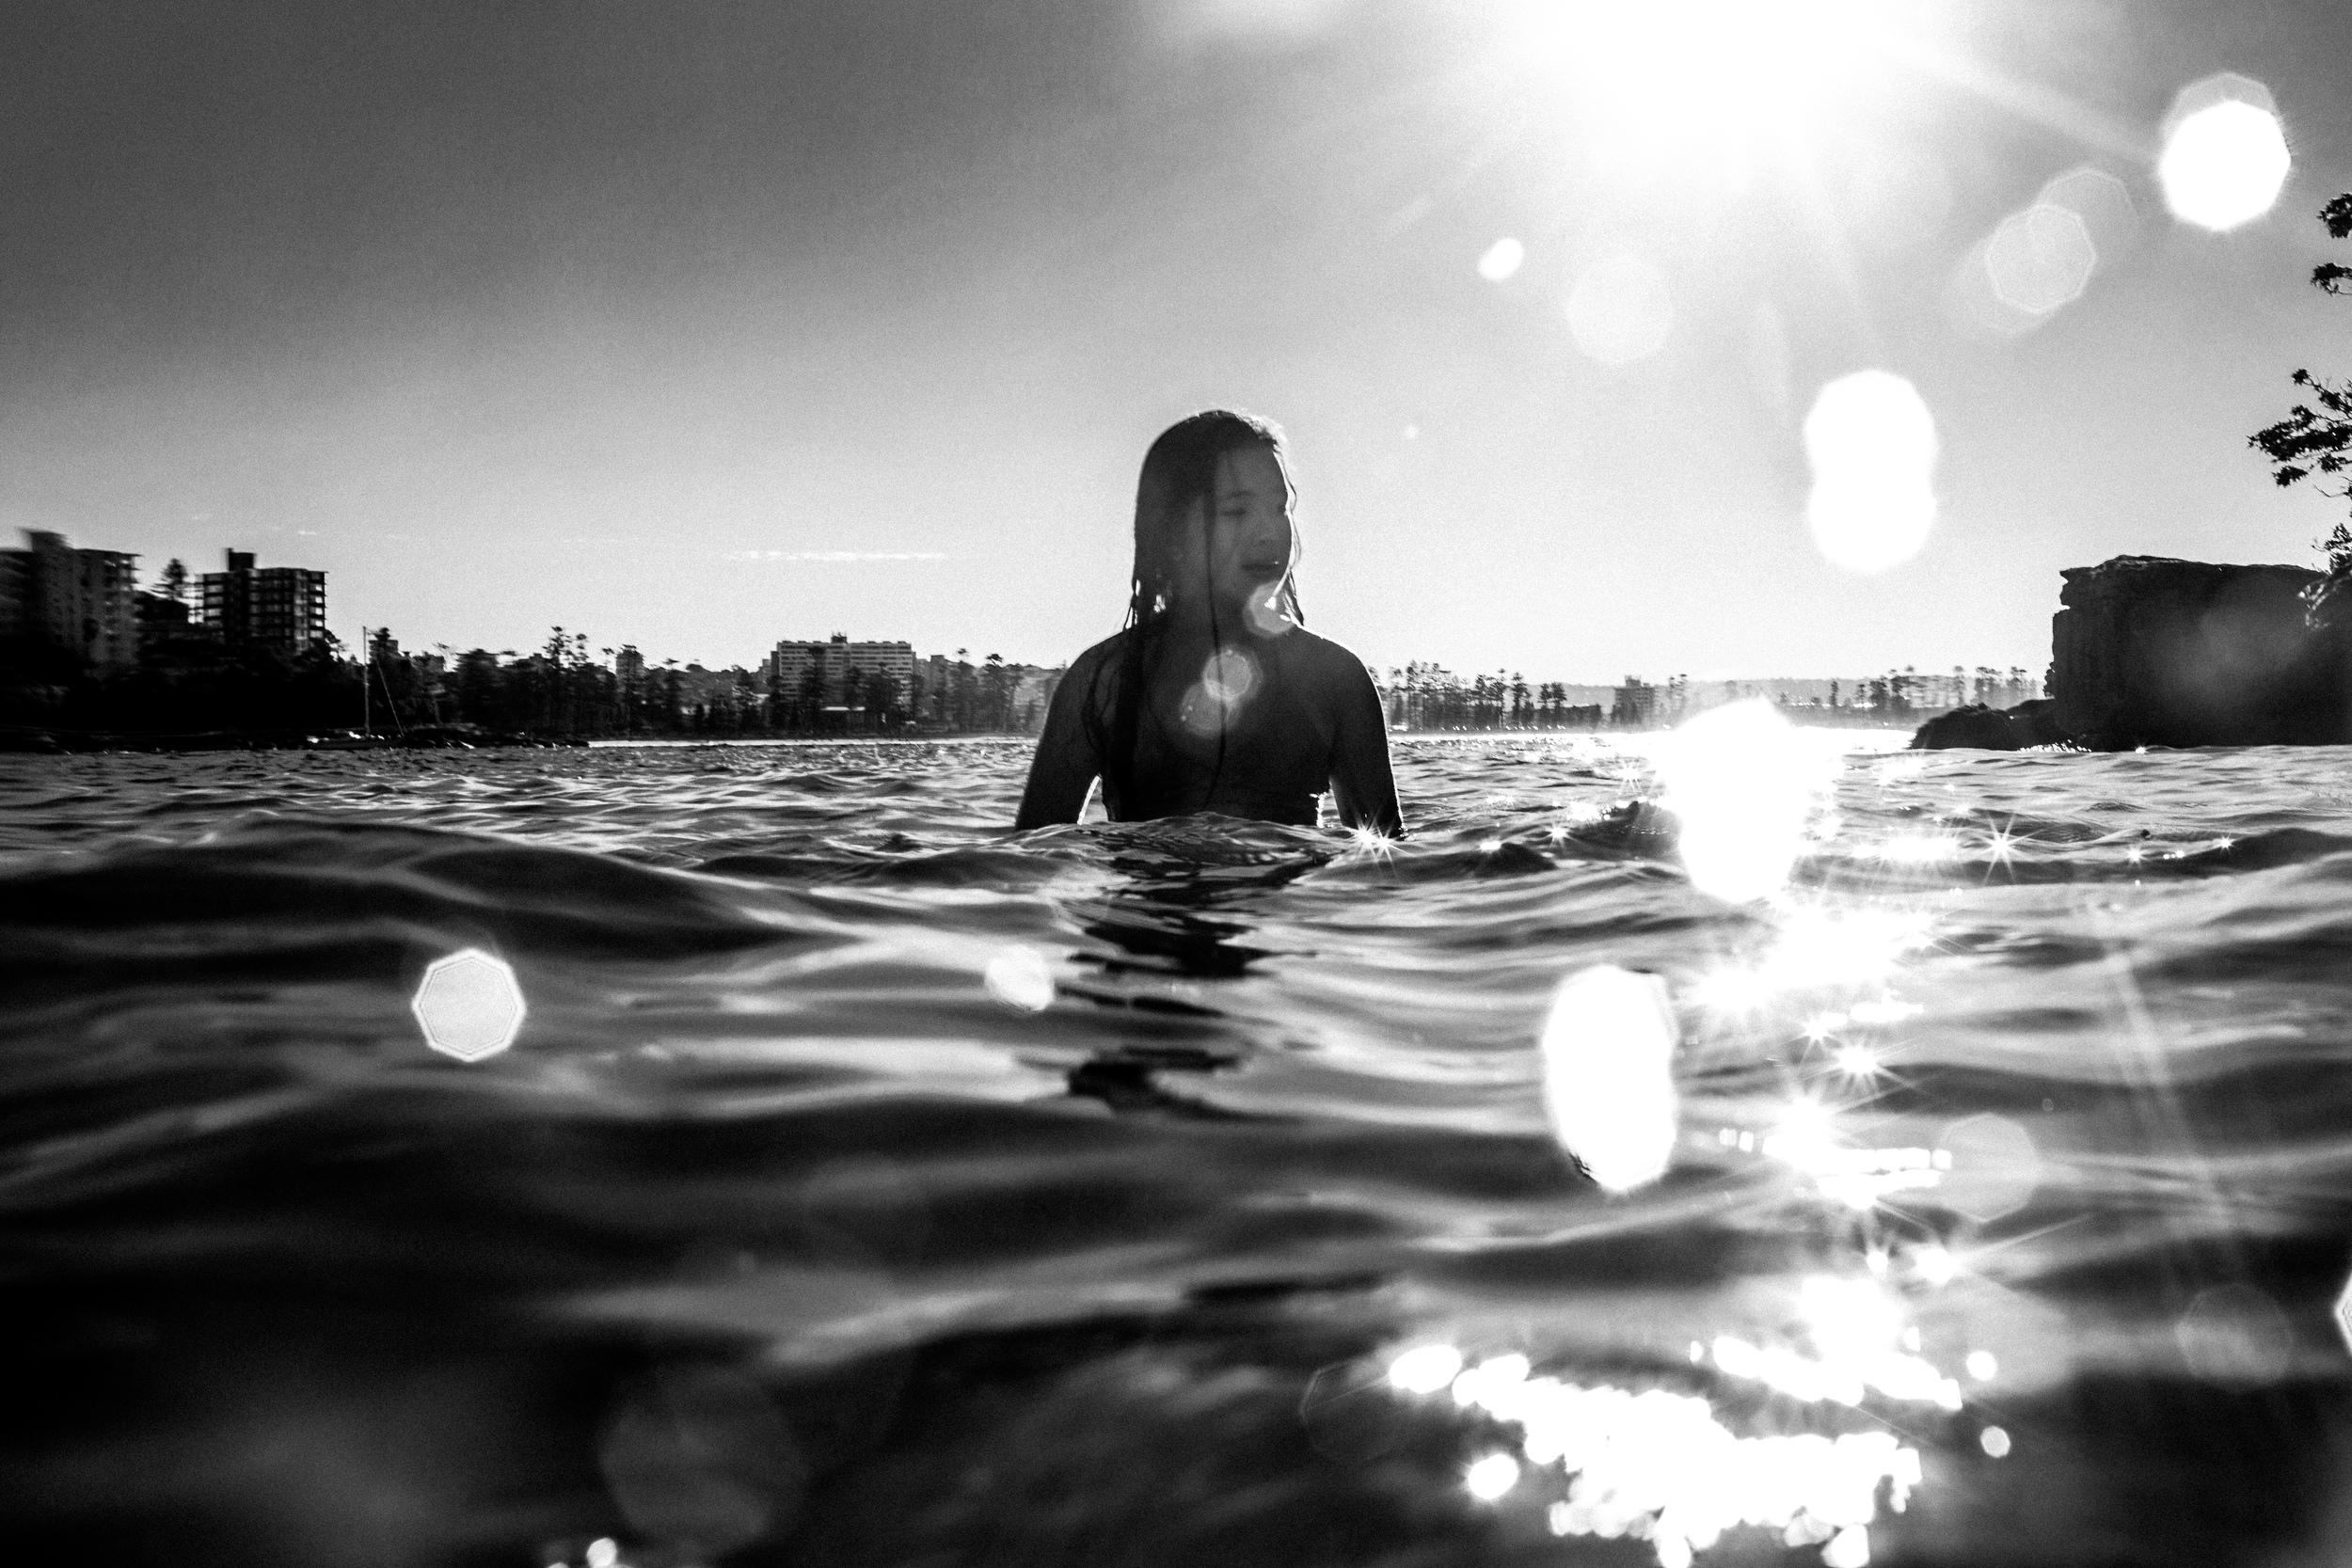 underwaterphotography (8 of 9).jpg